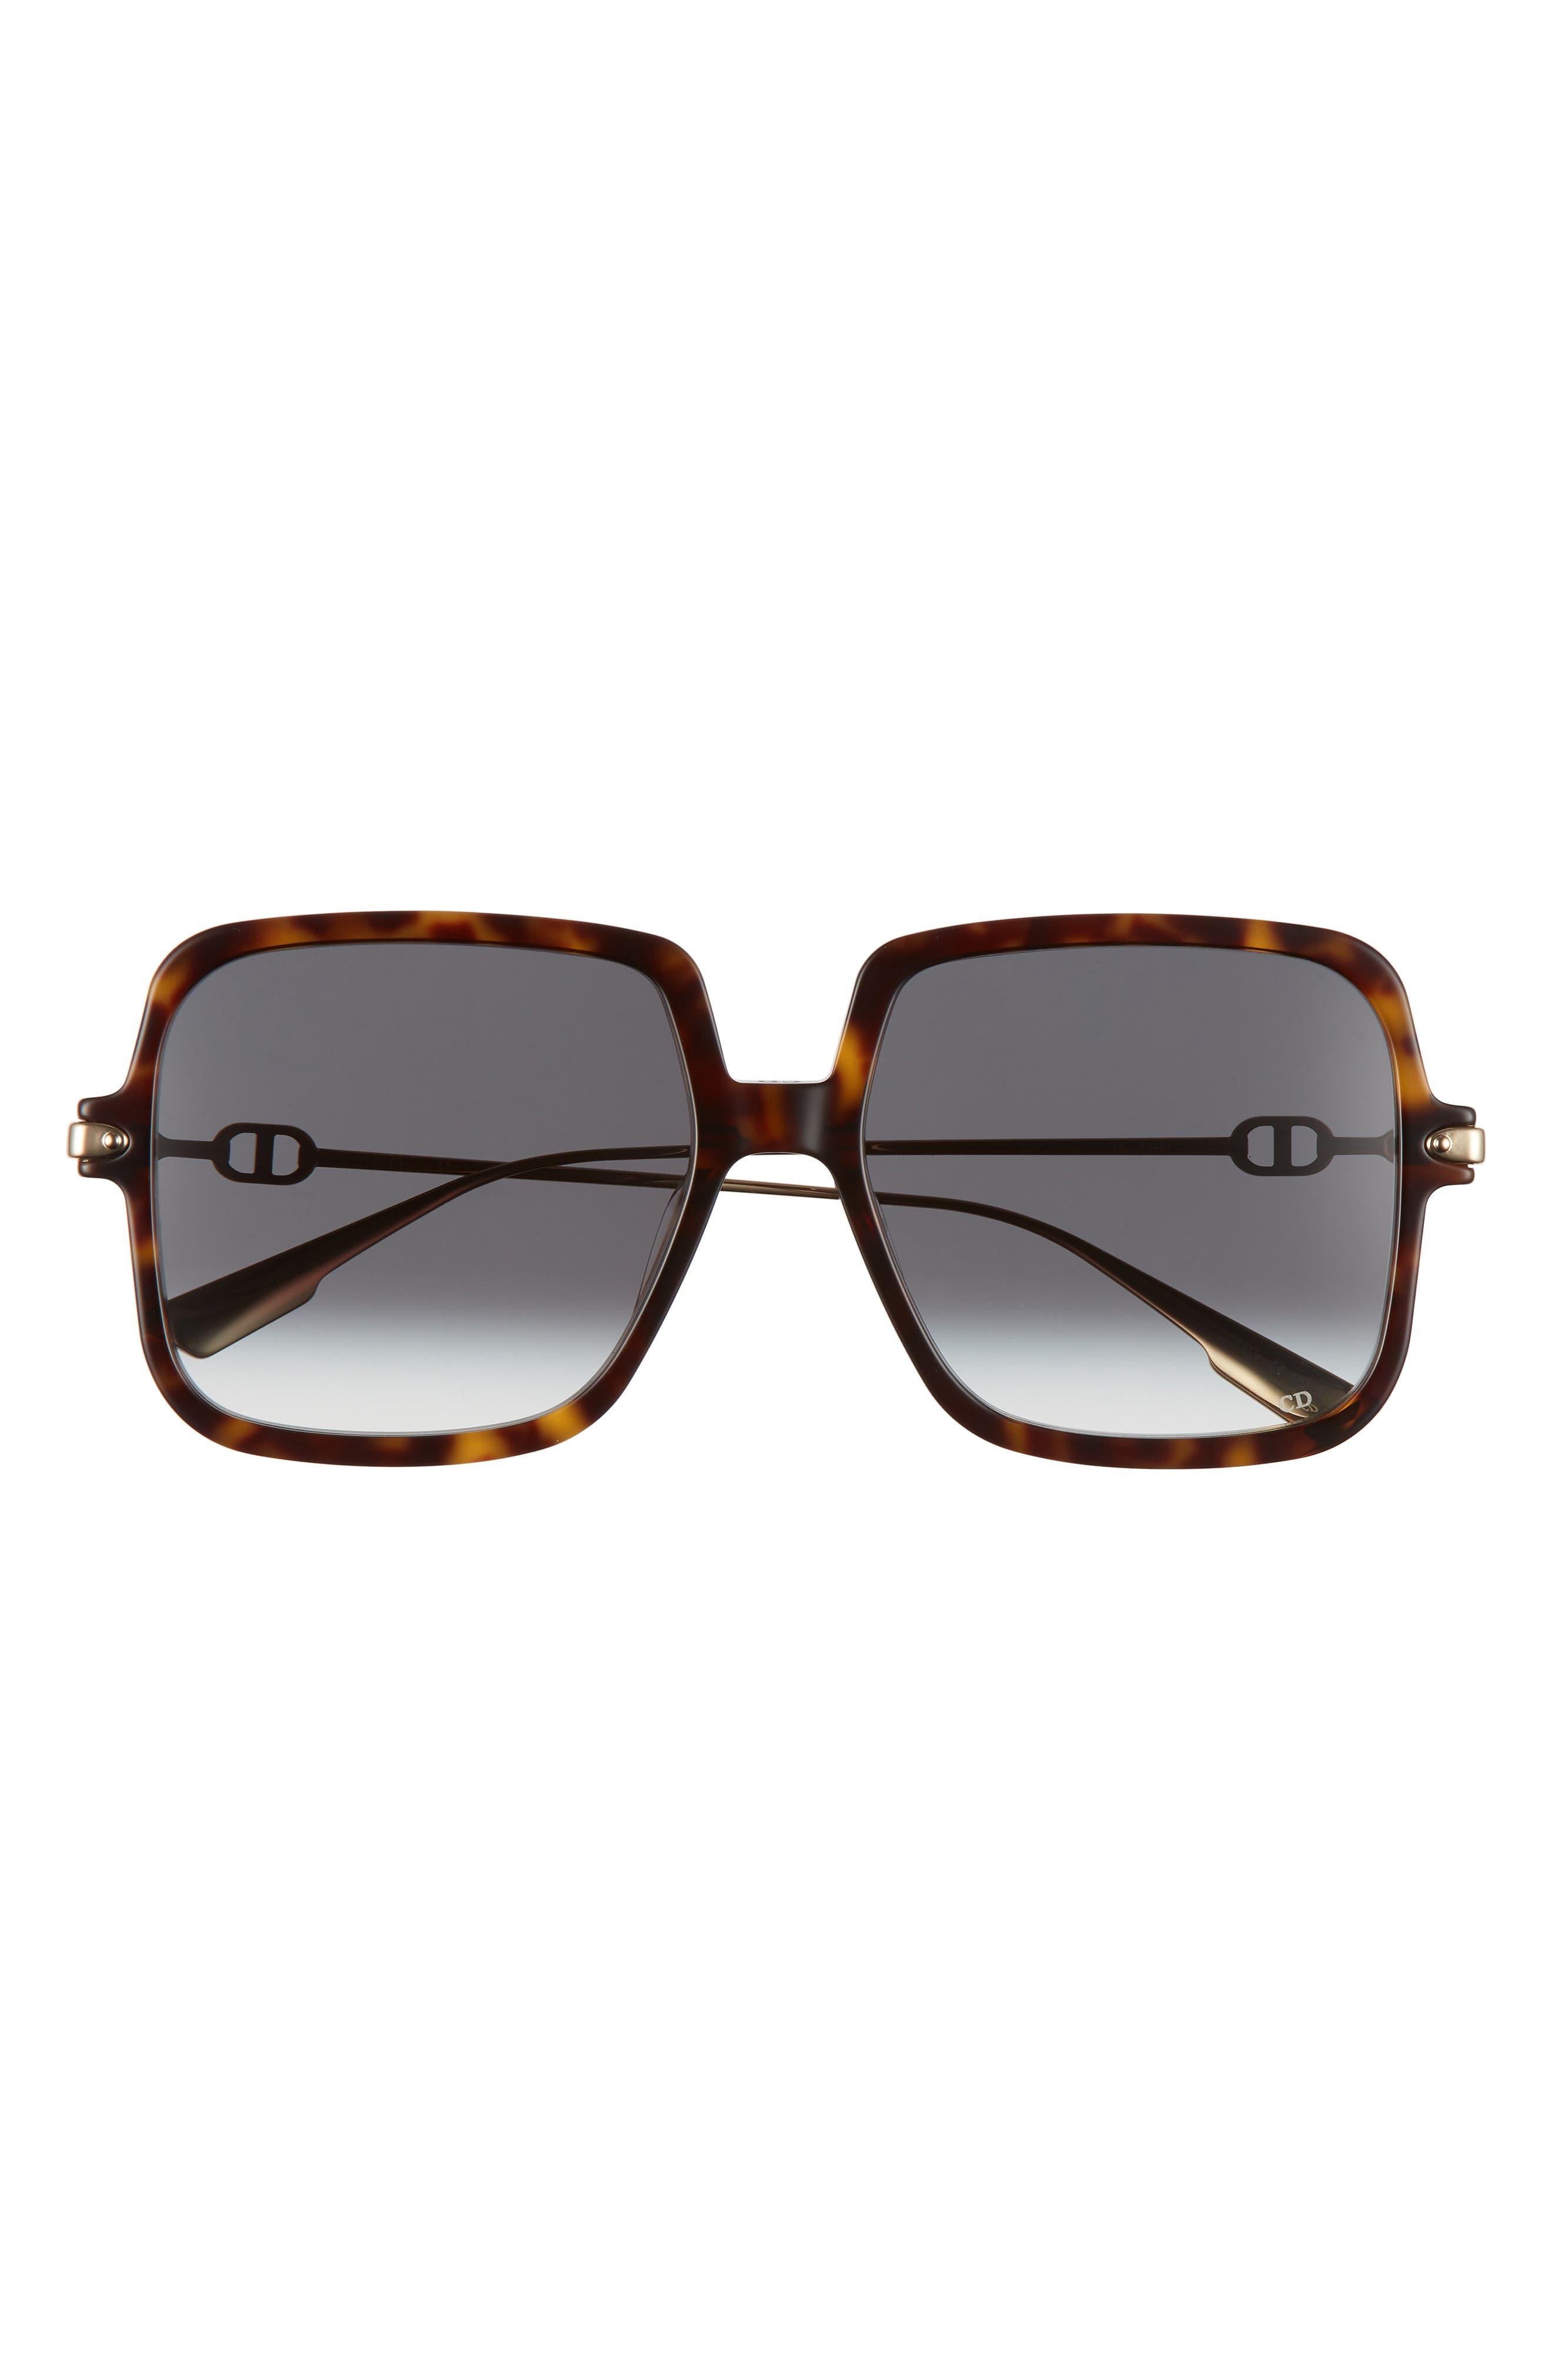 Image of Dior link1 58mm Gradient Square Sunglasses